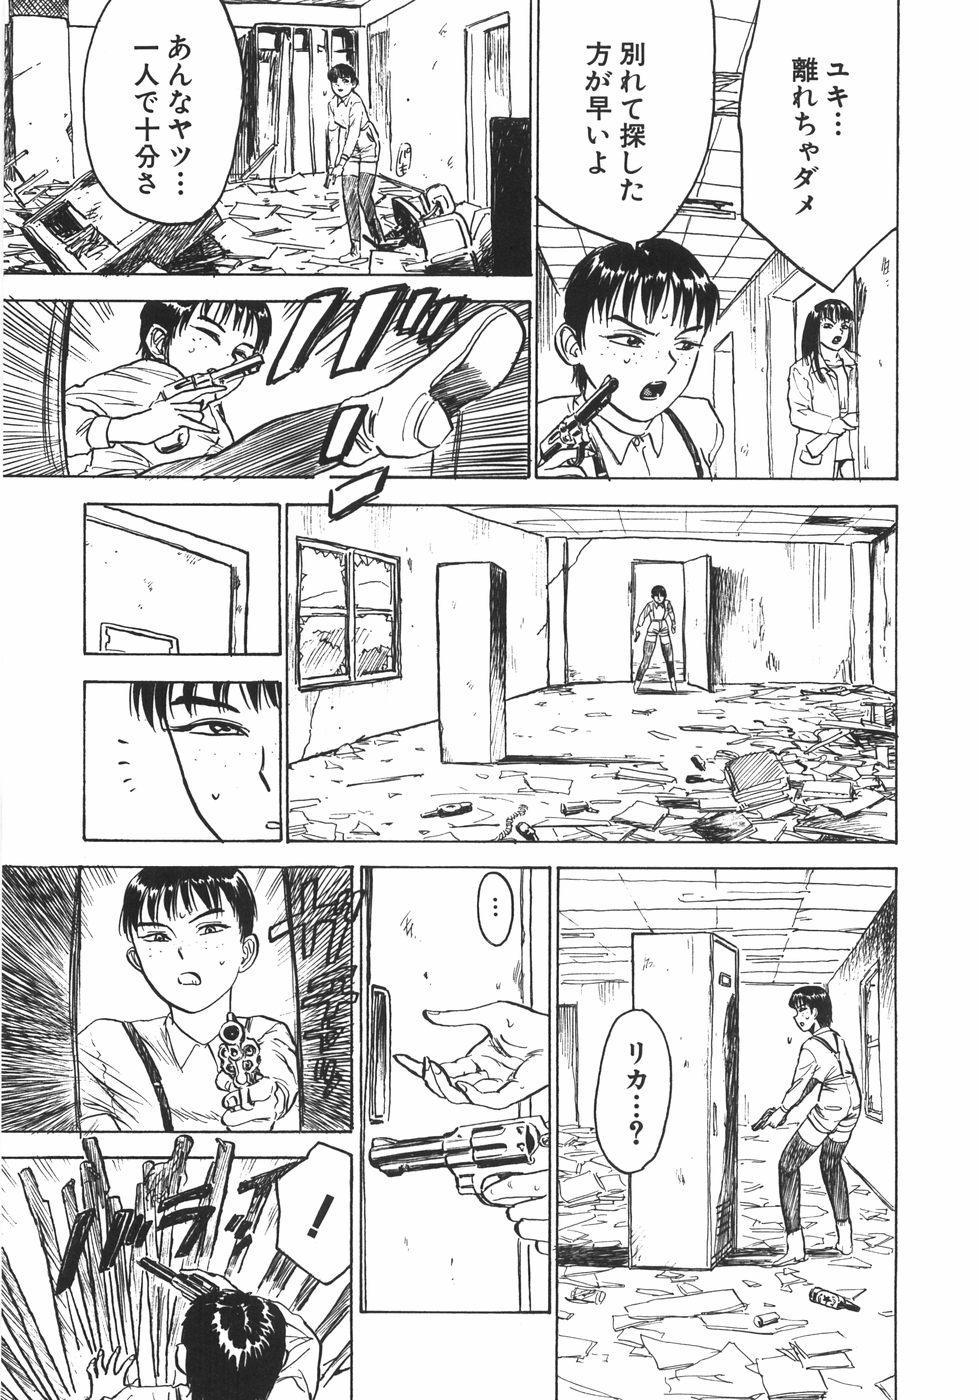 Ningyou no Yakata - The Doll House 125